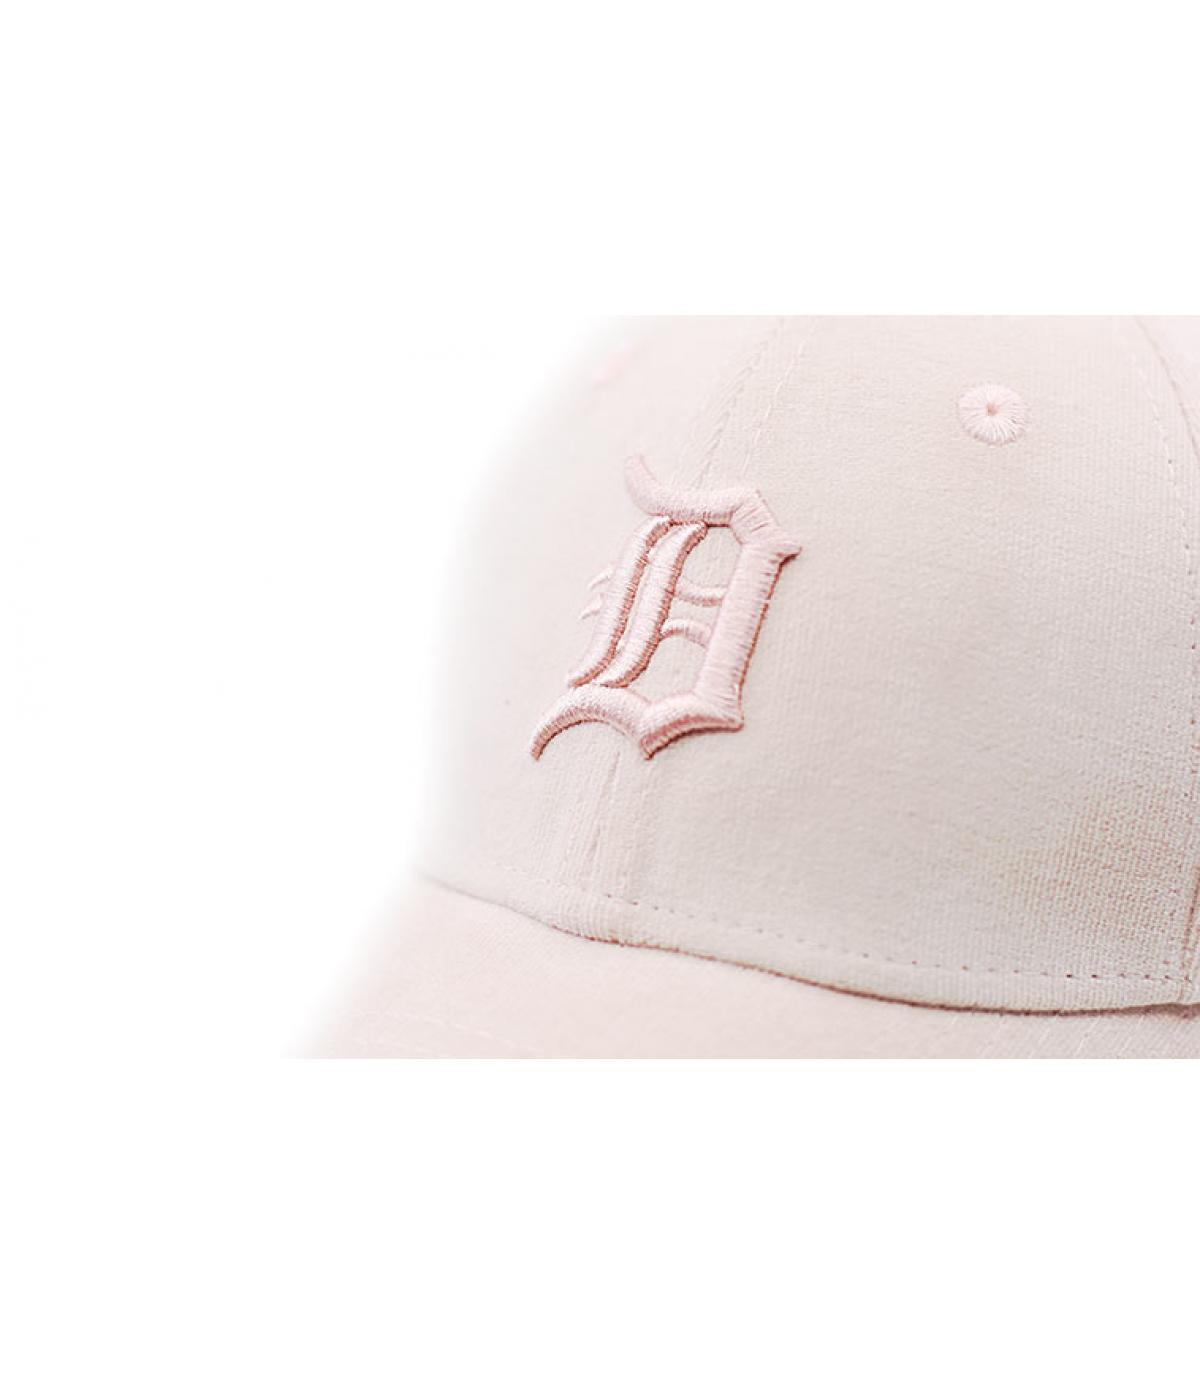 Details Female Micro Cord Detroit pink - afbeeling 3